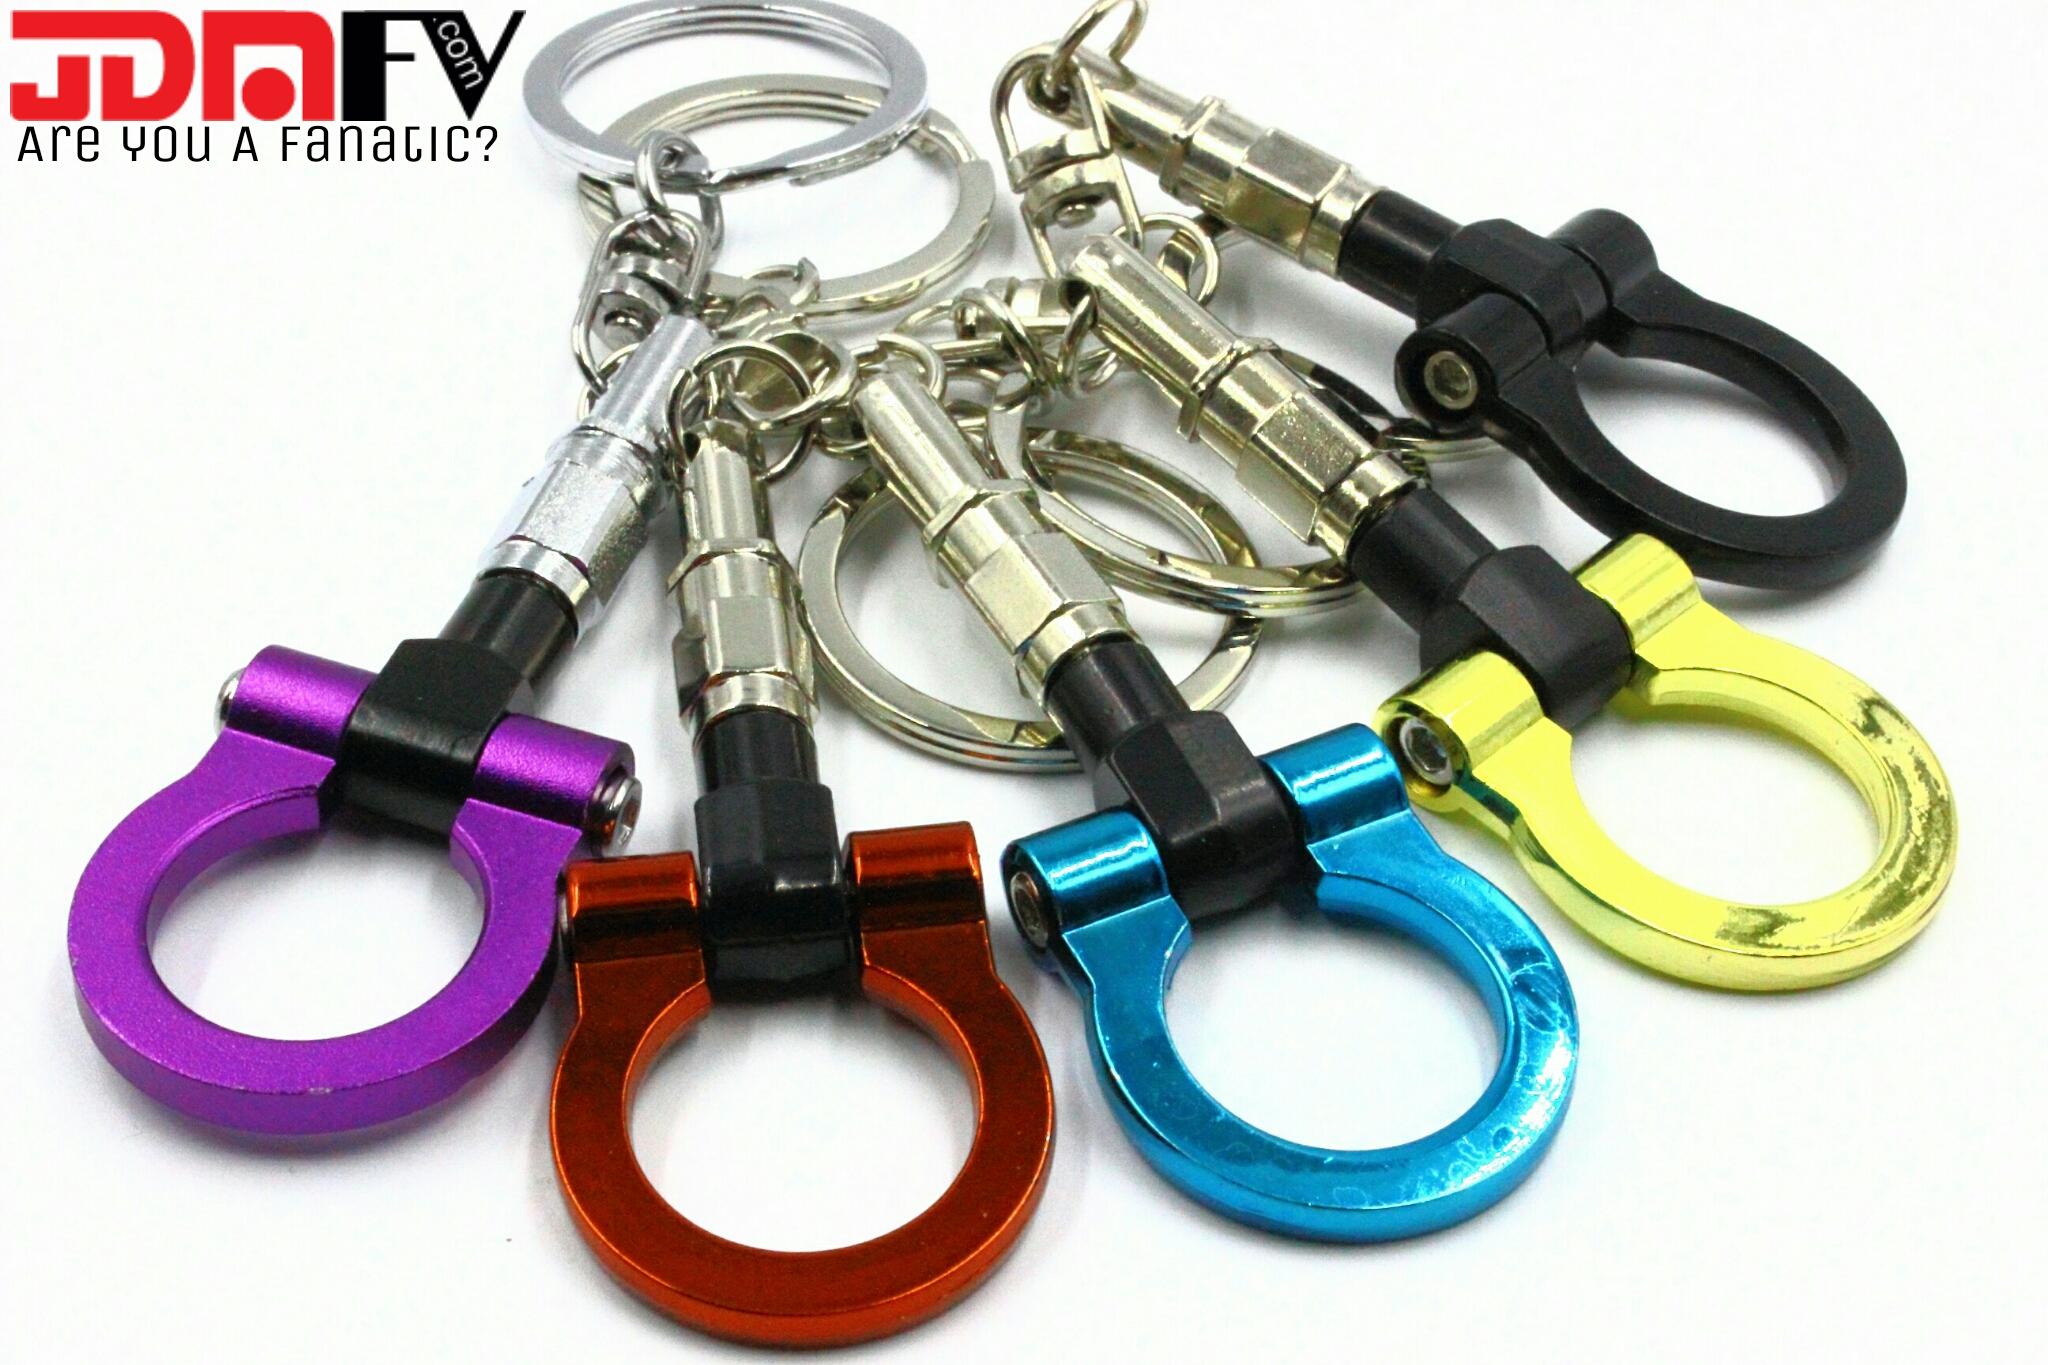 tow-hook-keychains-jdmfv.jpg